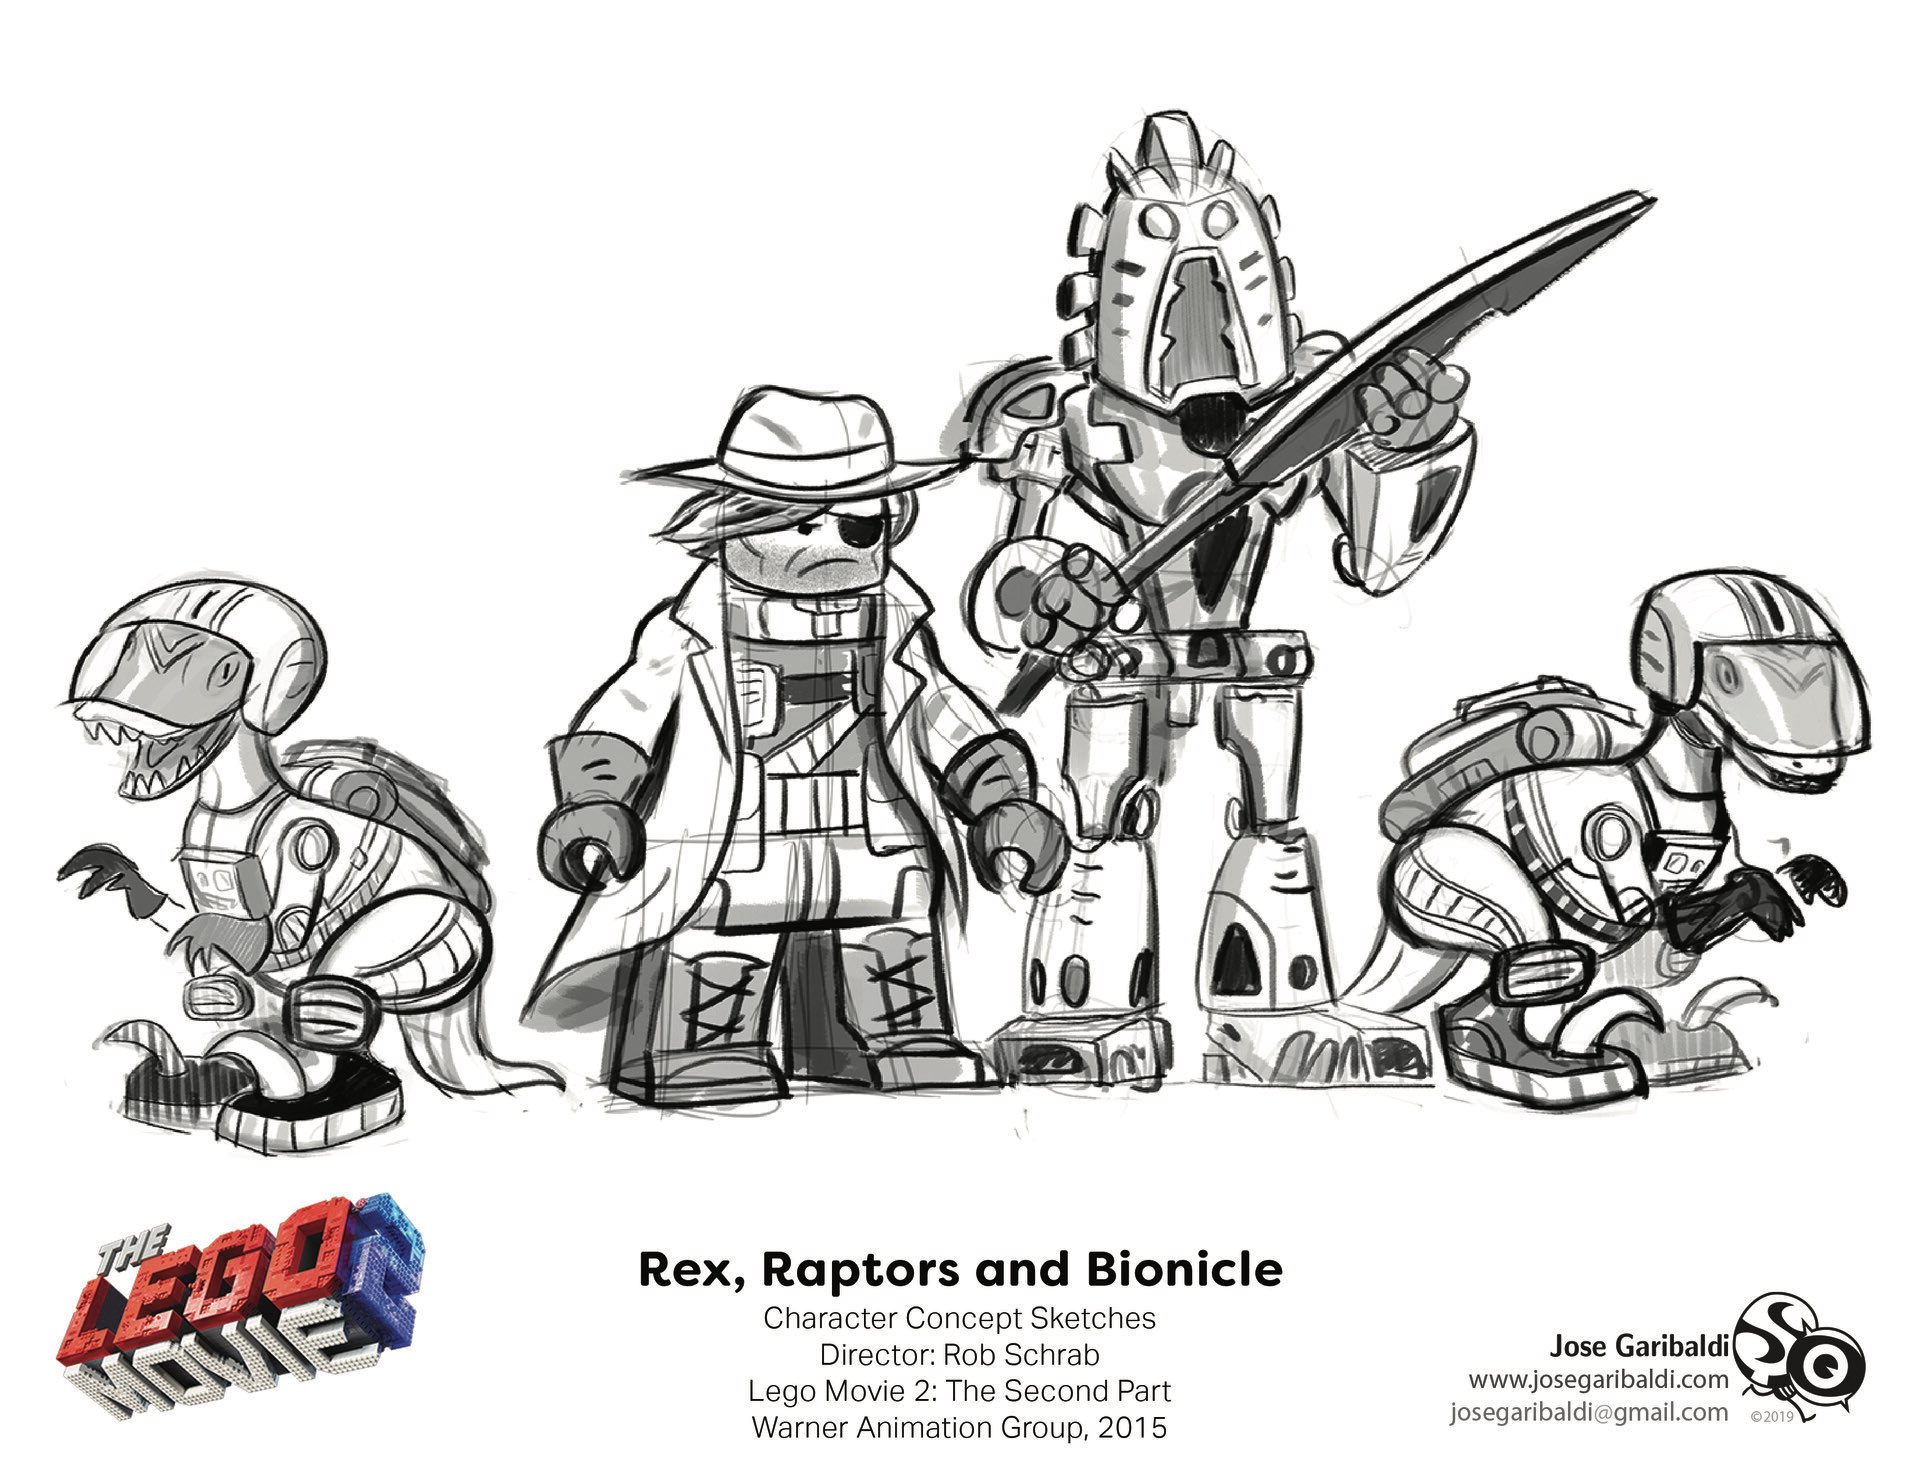 Takanuva dans la Grande Aventure LEGO 2 ? ECUwn-yWwAER796?format=jpg&name=large